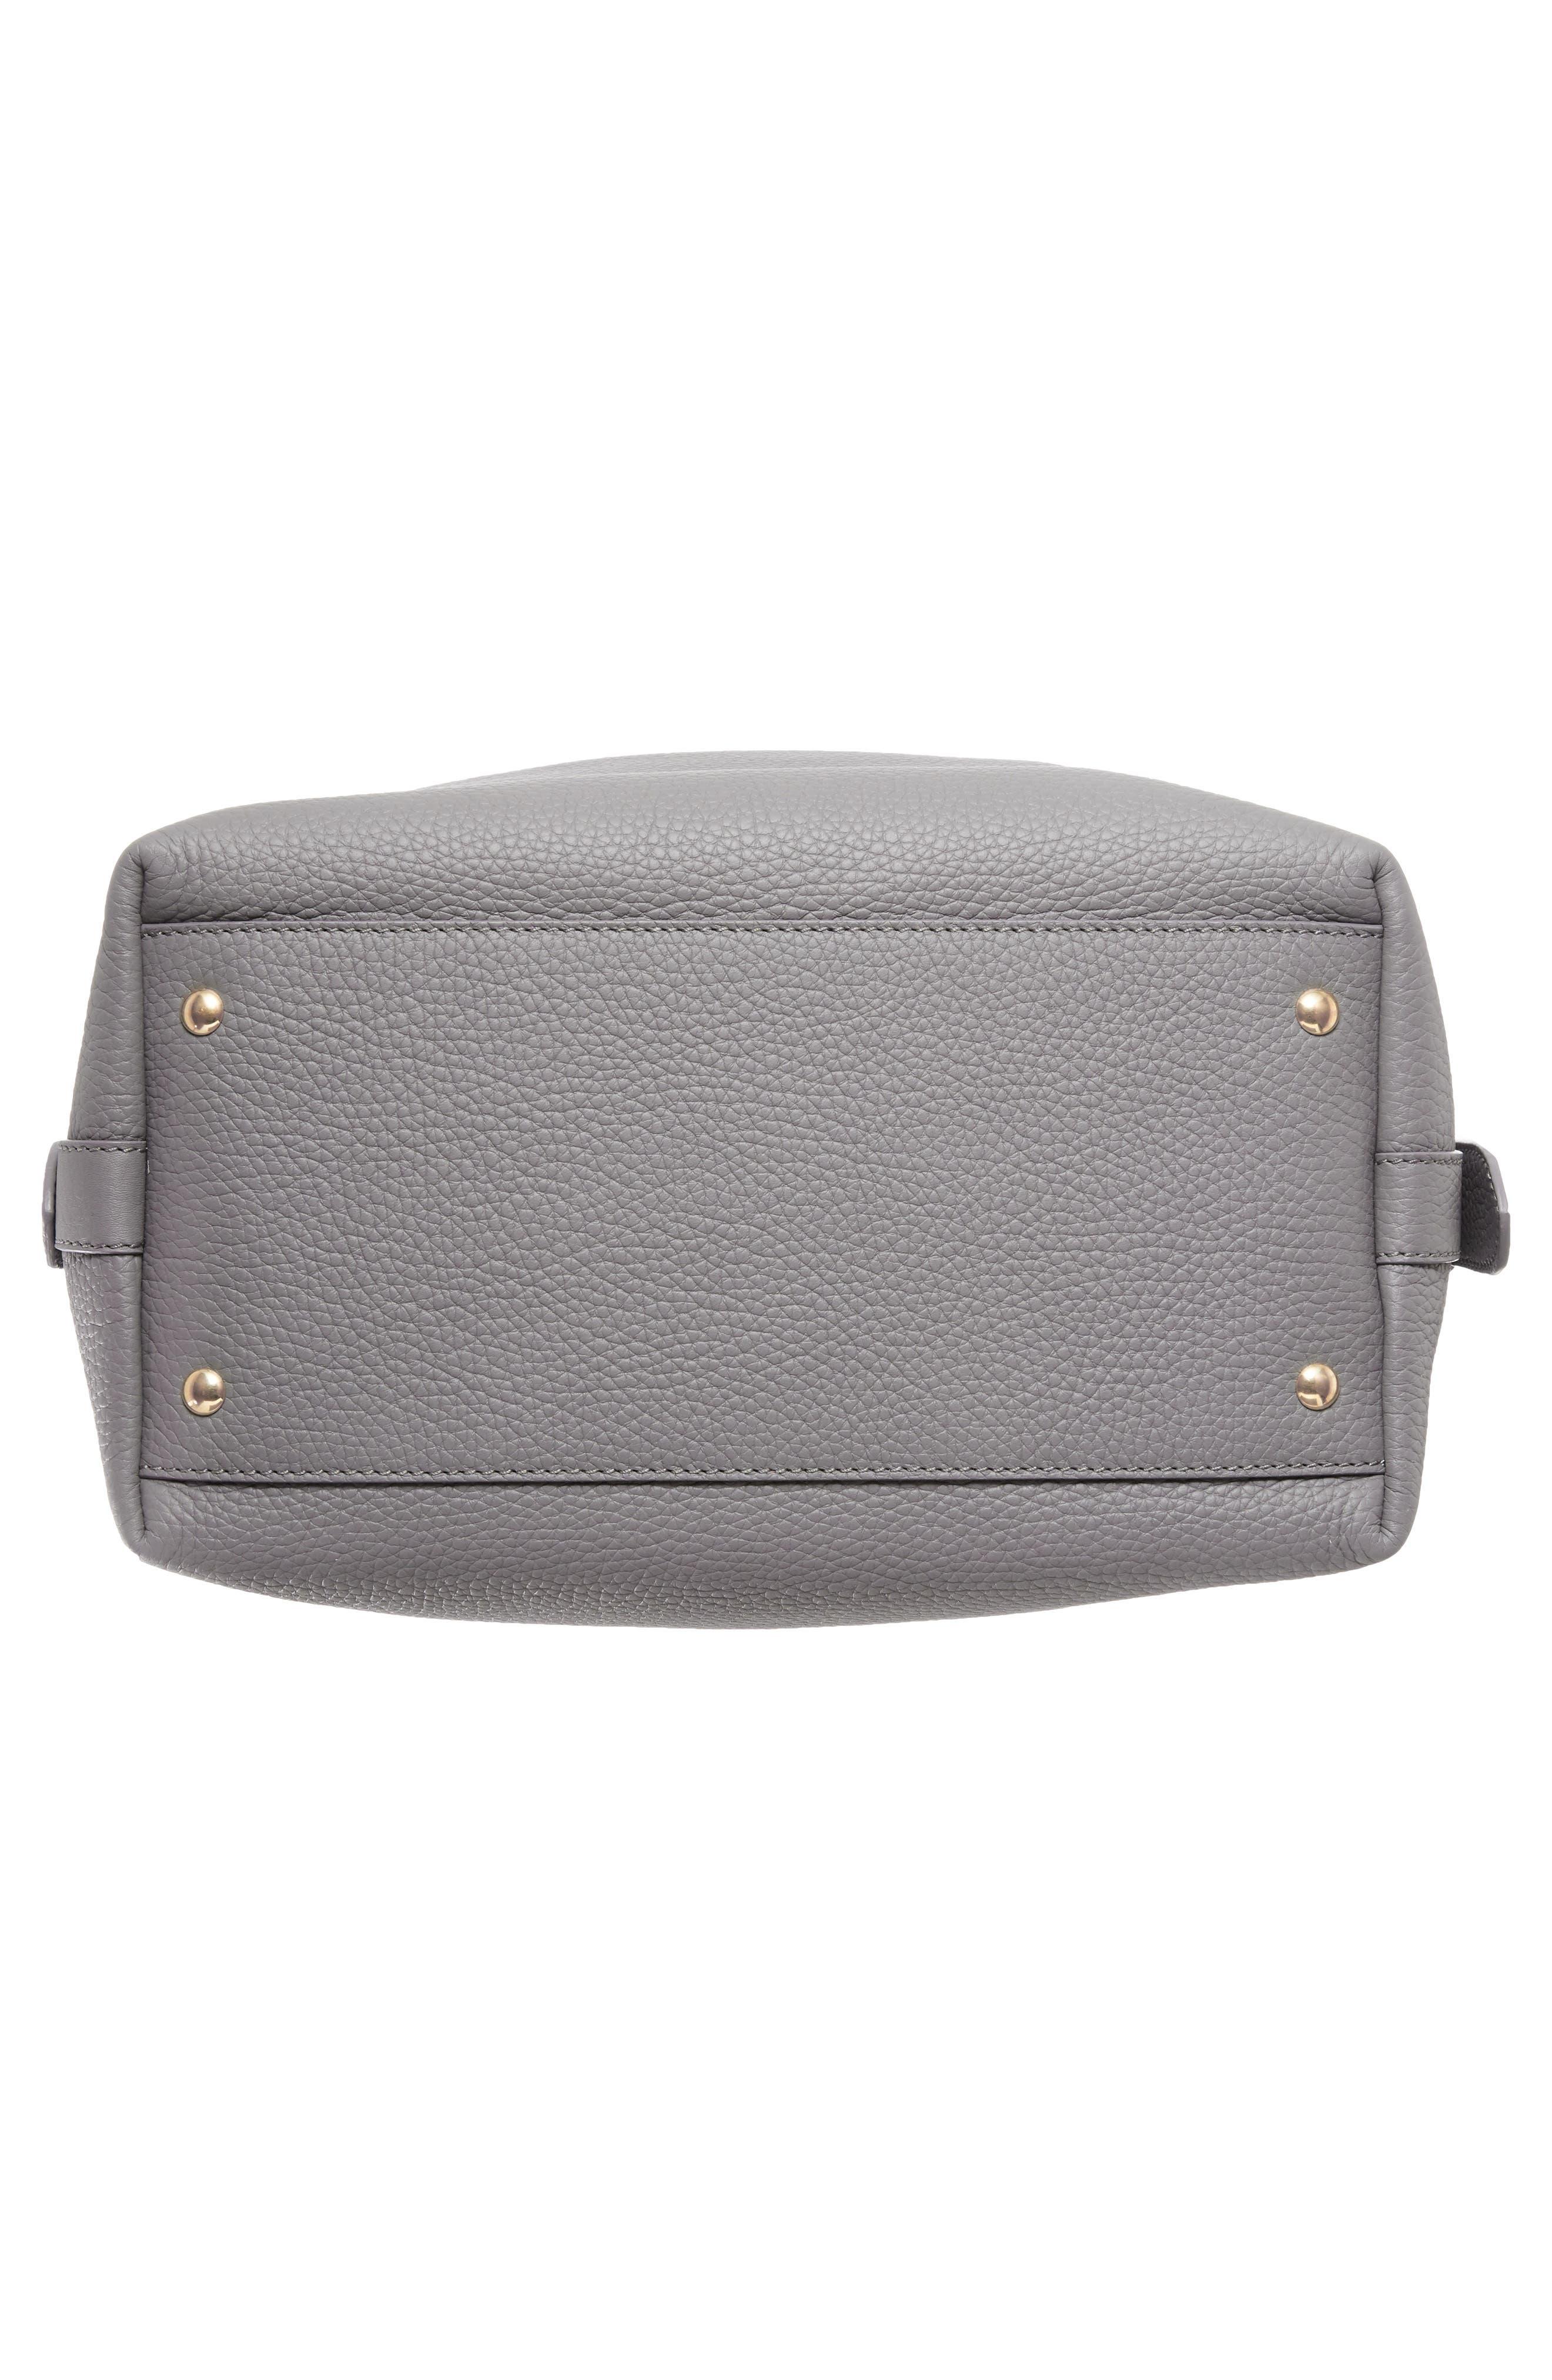 SALVATORE FERRAGAMO,                             Pebbled Leather Drawstring Bucket Bag,                             Alternate thumbnail 6, color,                             020